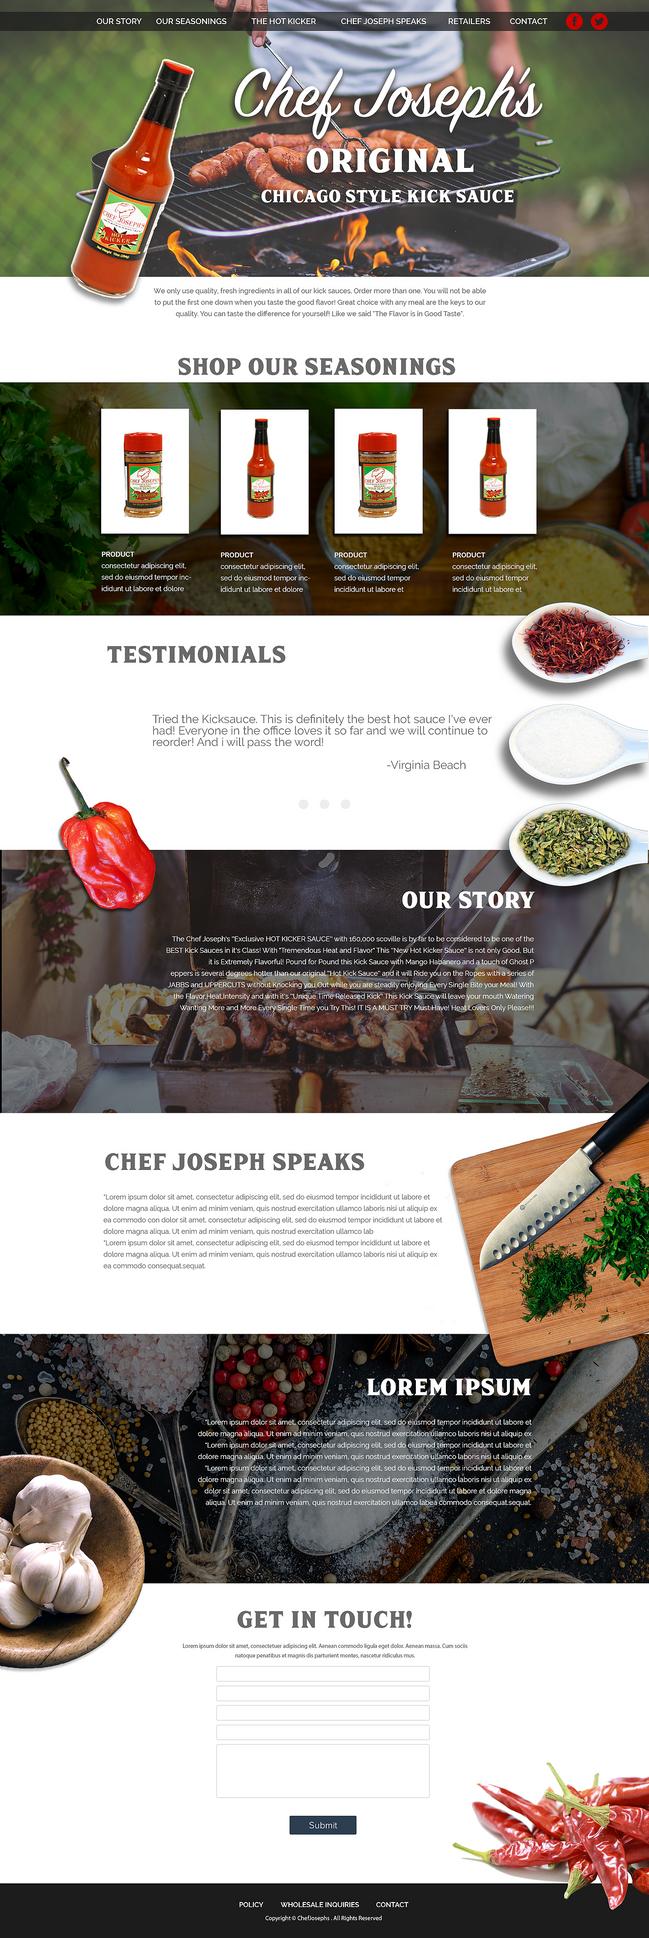 Chef Joeseph's